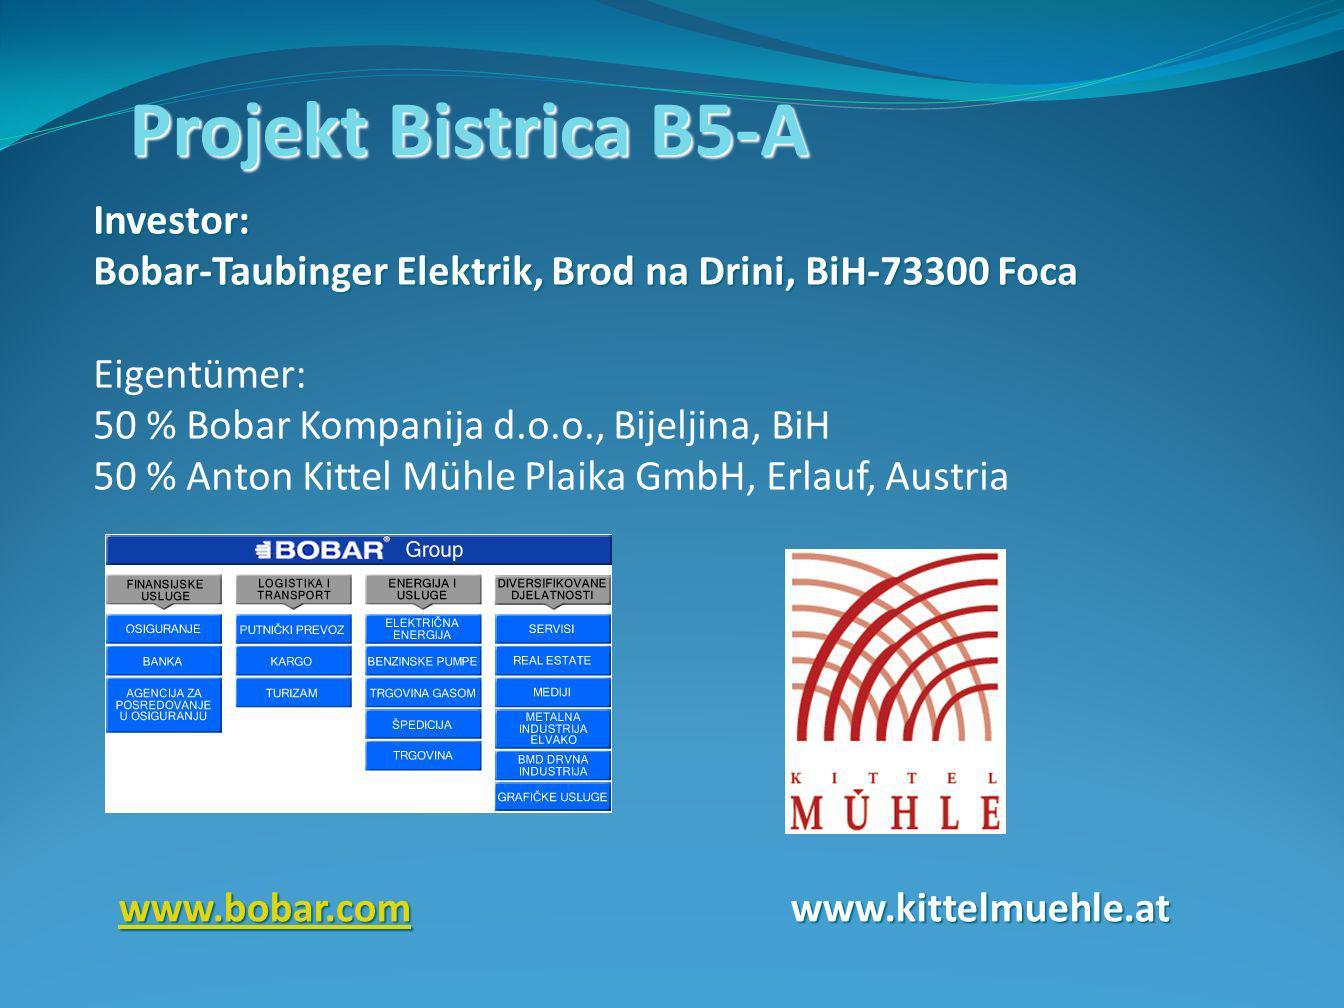 Projekt Bistrica B5-A Investor: Bobar-Taubinger Elektrik, Brod na Drini, BiH-73300 Foca Eigentümer: 50 % Bobar Kompanija d.o.o., Bijeljina, BiH 50 % Anton Kittel Mühle Plaika GmbH, Erlauf, Austria www.bobar.comwww.bobar.comwww.kittelmuehle.at www.bobar.com